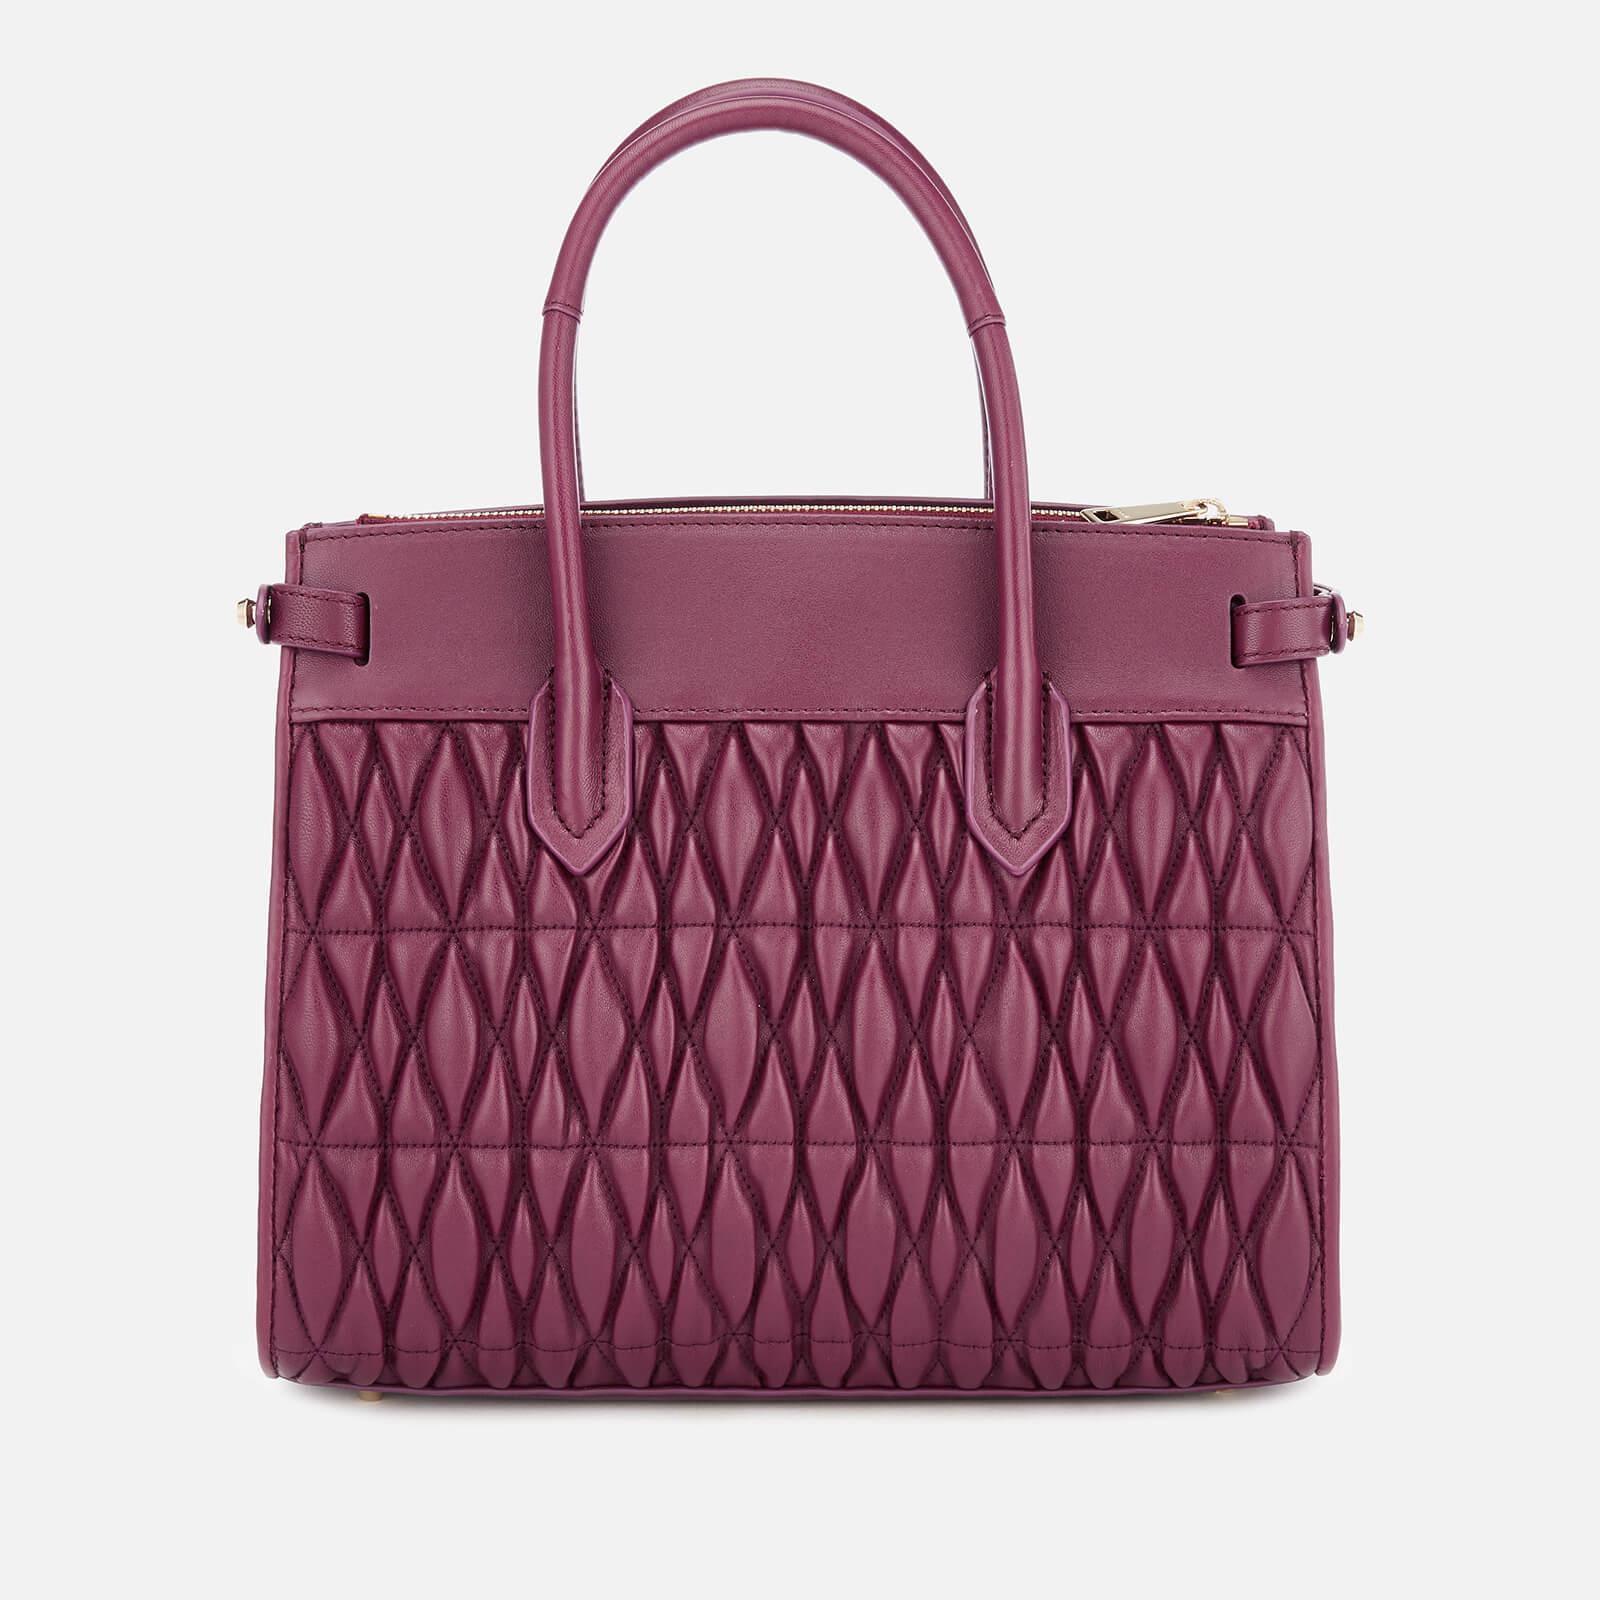 Lyst - Furla Pin Cometa Small Tote Bag in Purple 39250b18623